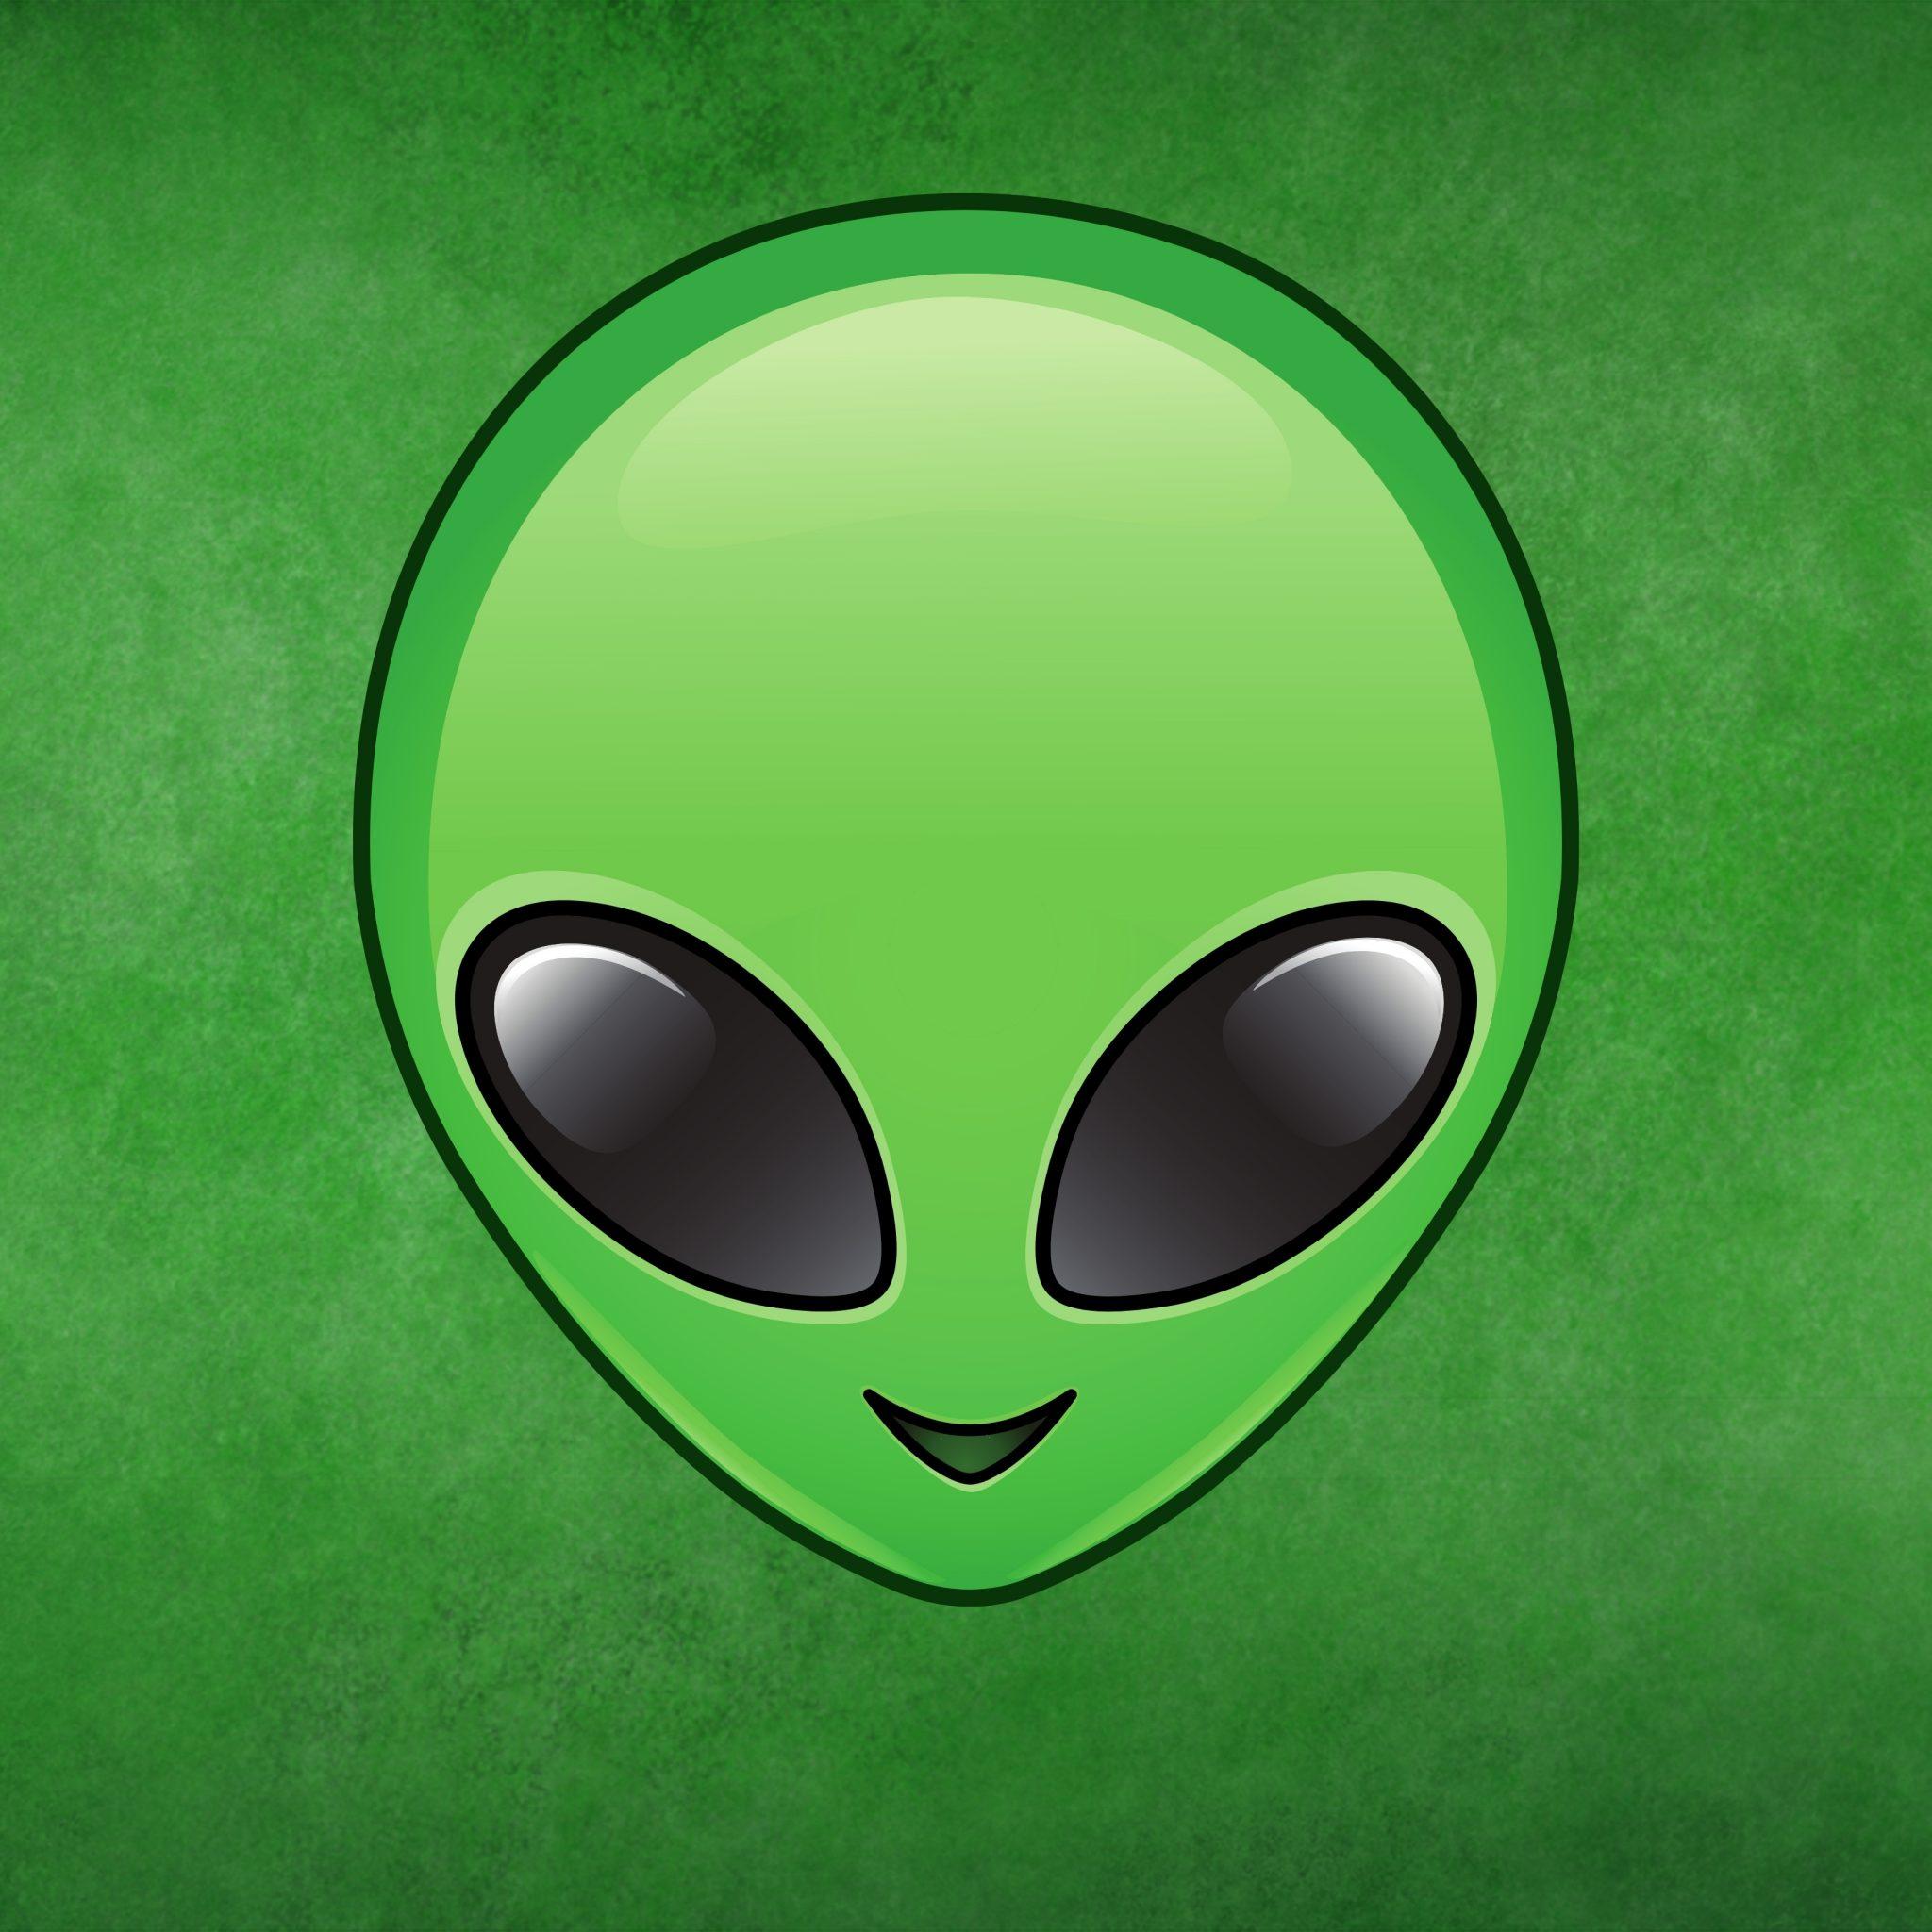 2048x2048 wallpapers iPad retina Alien Emoji Face Invader Halloween Spaceship Green iPad Wallpaper 2048x2048 pixels resolution